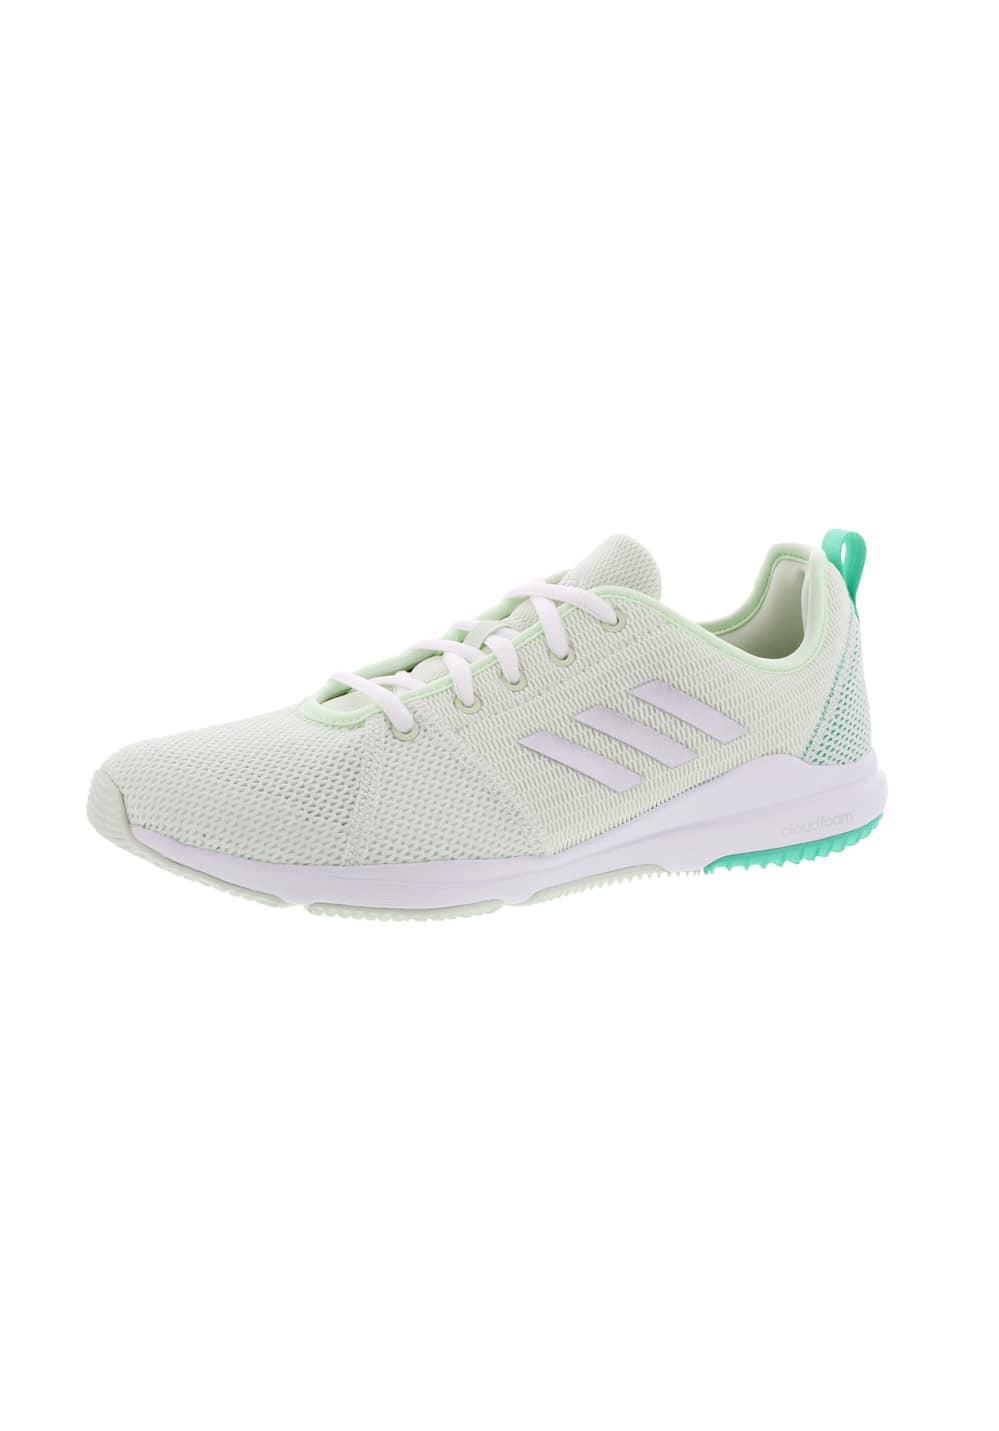 innovative design c8b43 047c3 adidas Arianna Cloudfoam - Fitness shoes for Women - White  21RUN